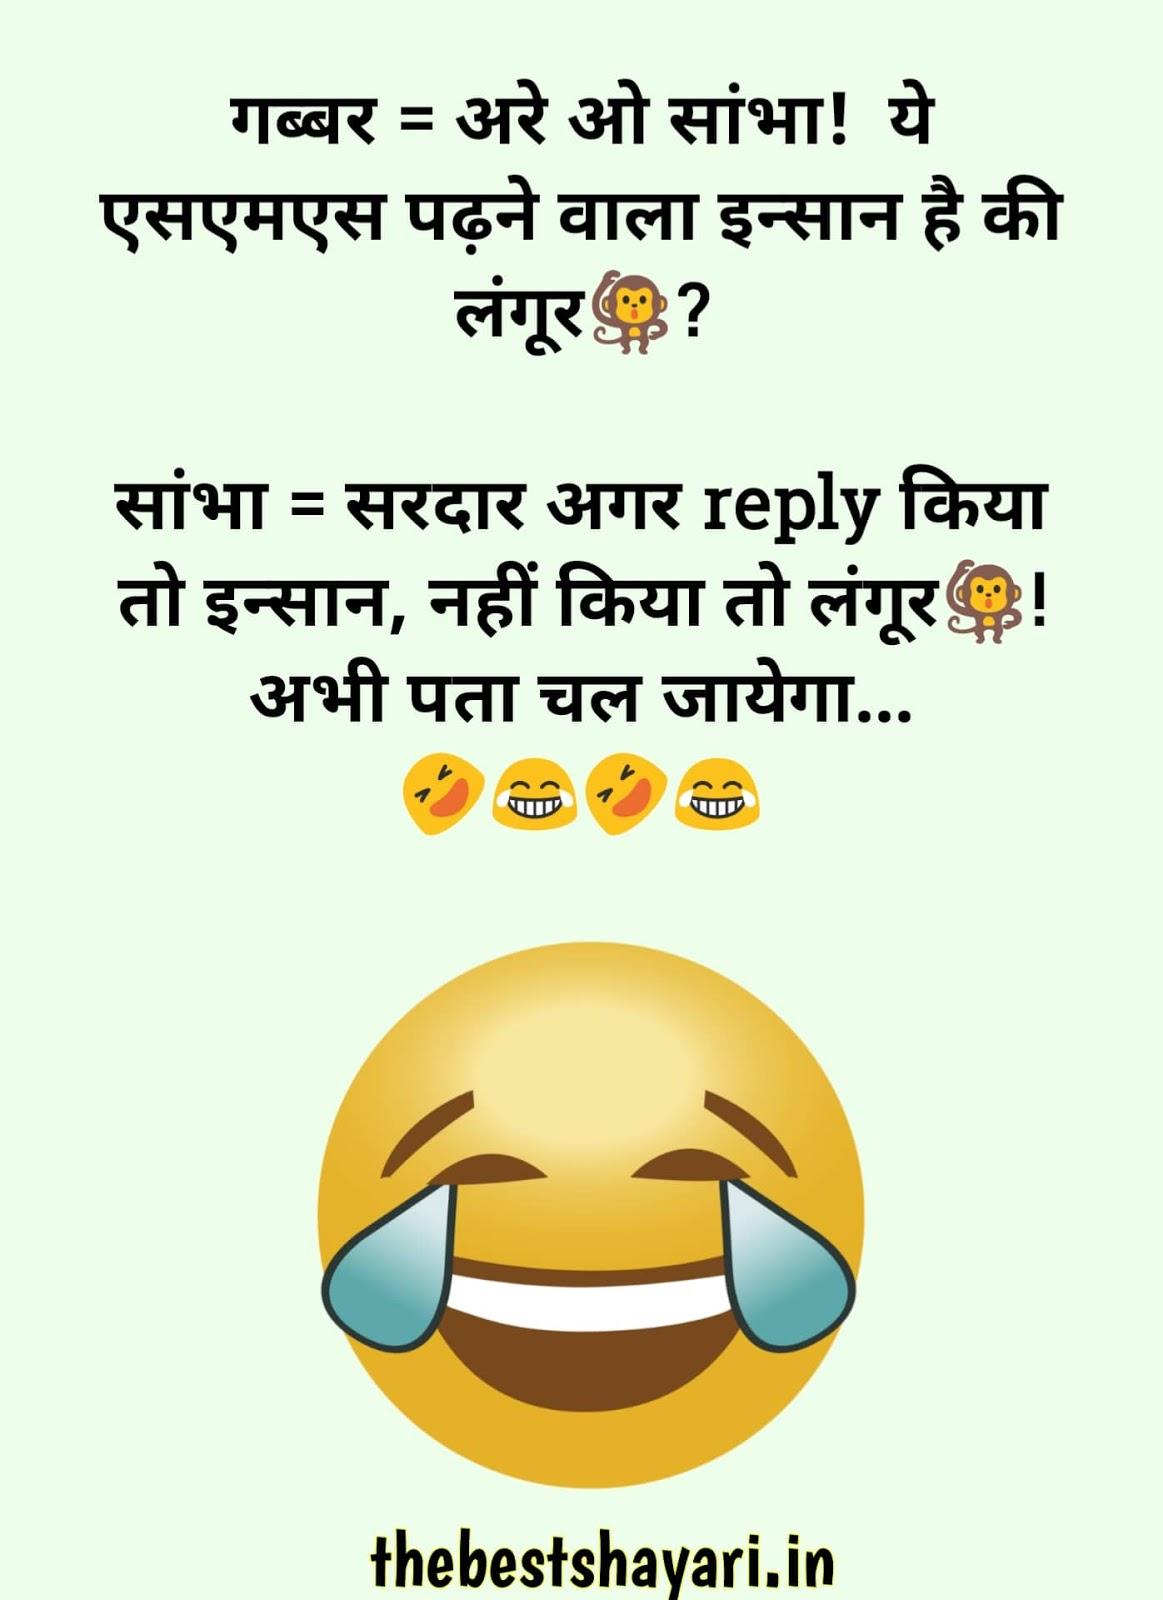 Comedy chutkule in hindi